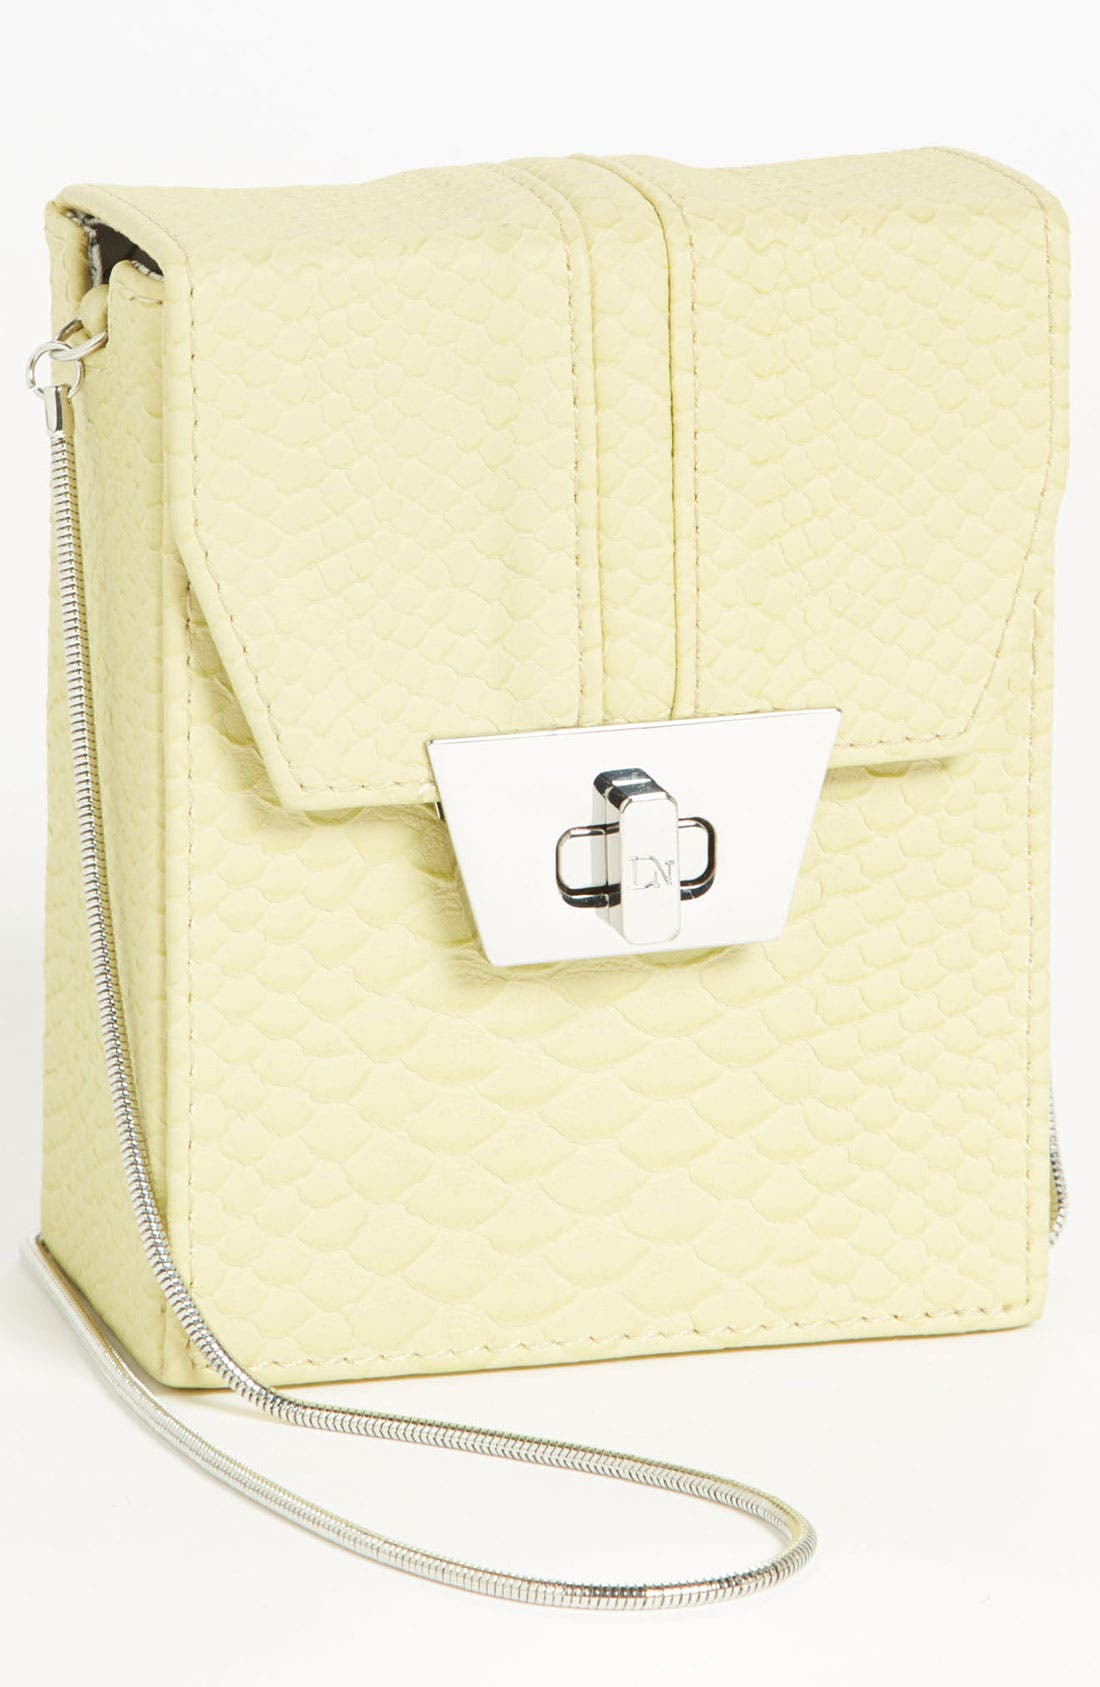 Main Image - Danielle Nicole 'Remi' Crossbody Bag